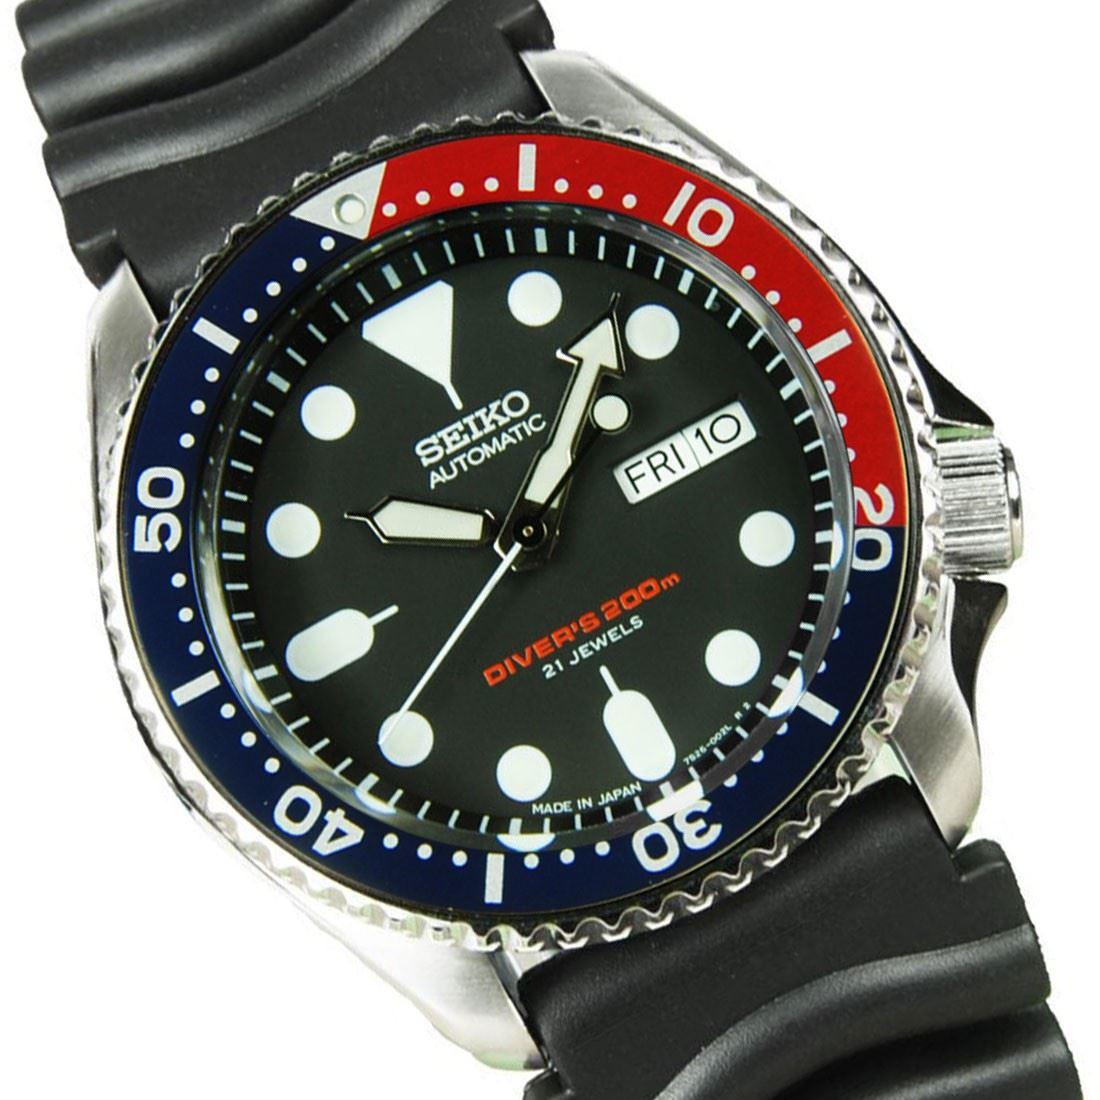 Seiko SK009J SKX009K1 SKX009J1 SNZF15K1 divers watch